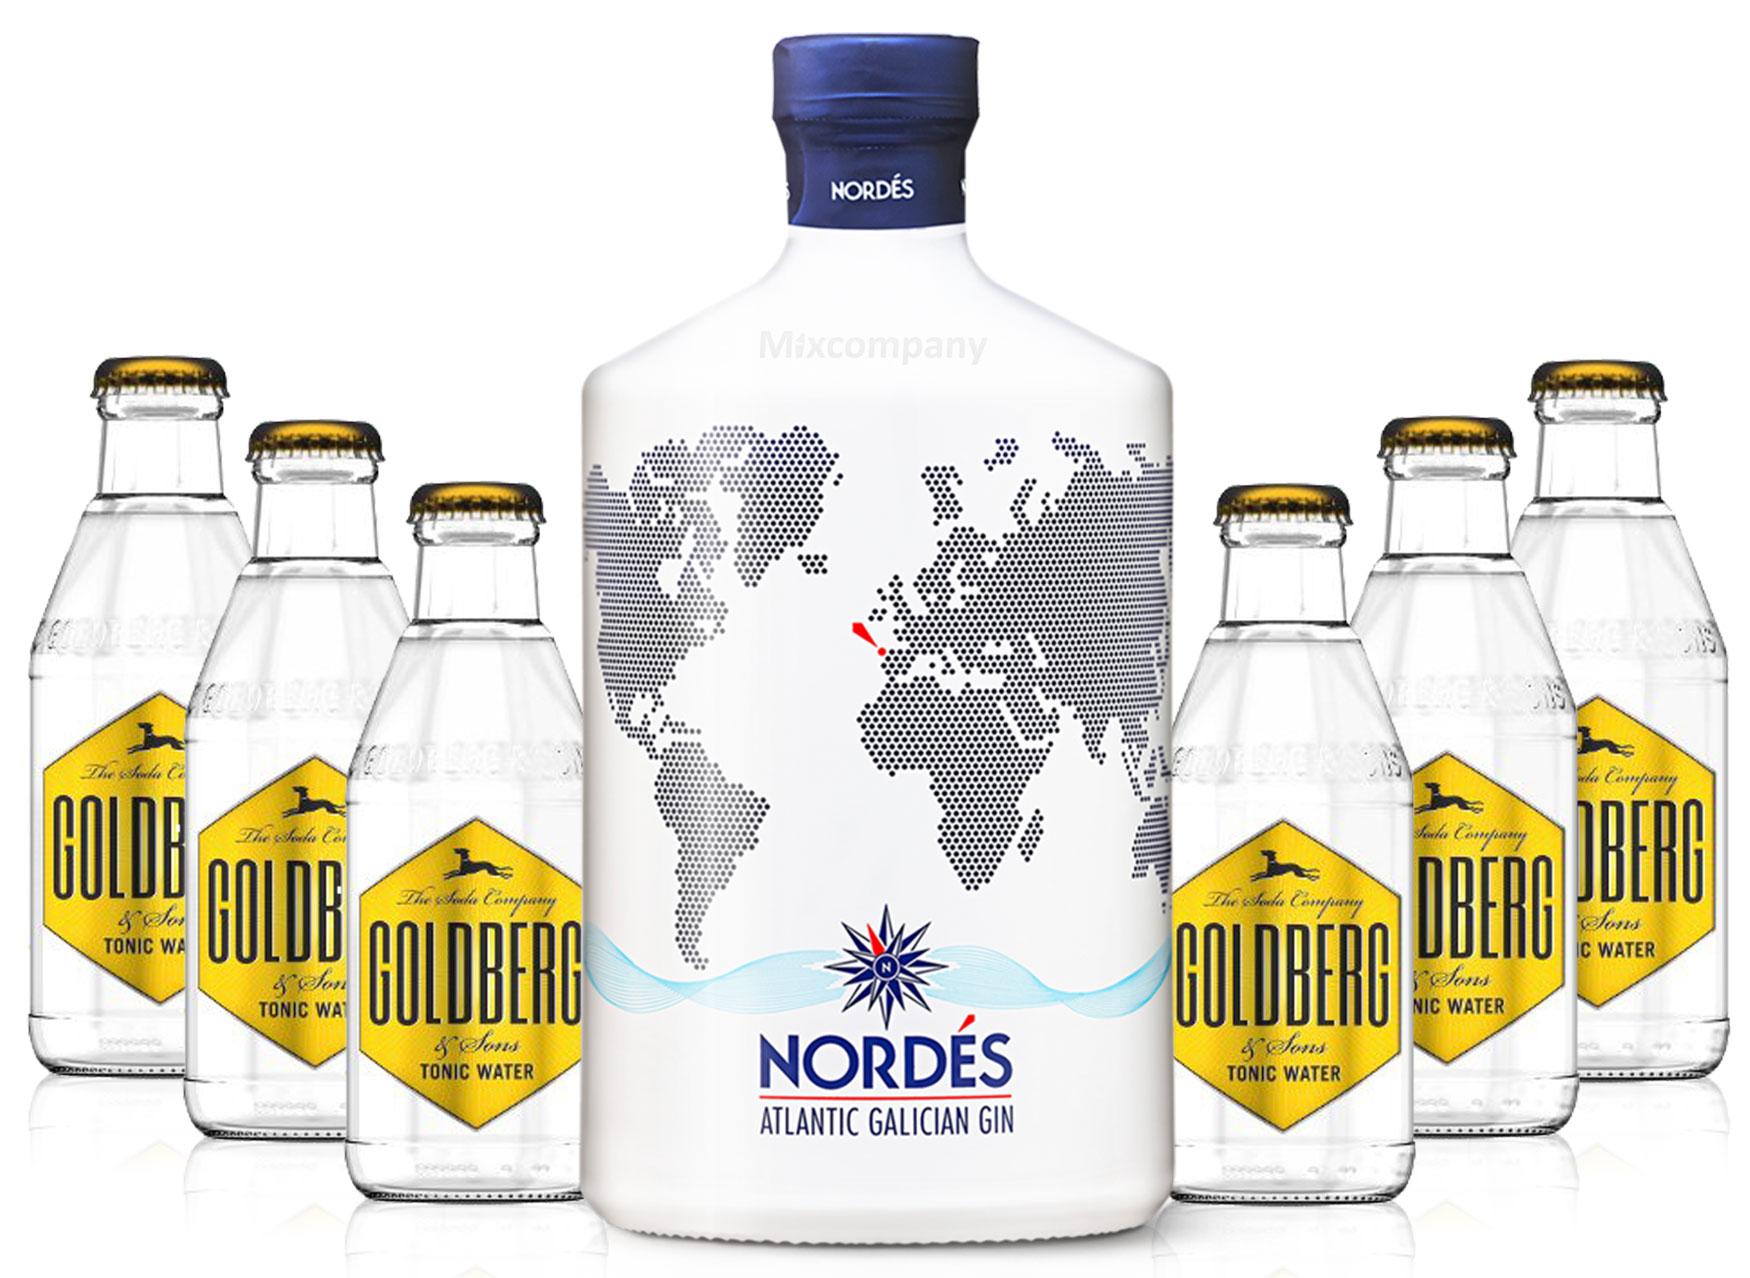 Nordes Atlantic Galician Gin aus Galizien 0,7l (40% Vol) + 6x Goldberg Tonic Water 0,2l MEHRWEG inkl. Pfand- [Enthält Sulfite]